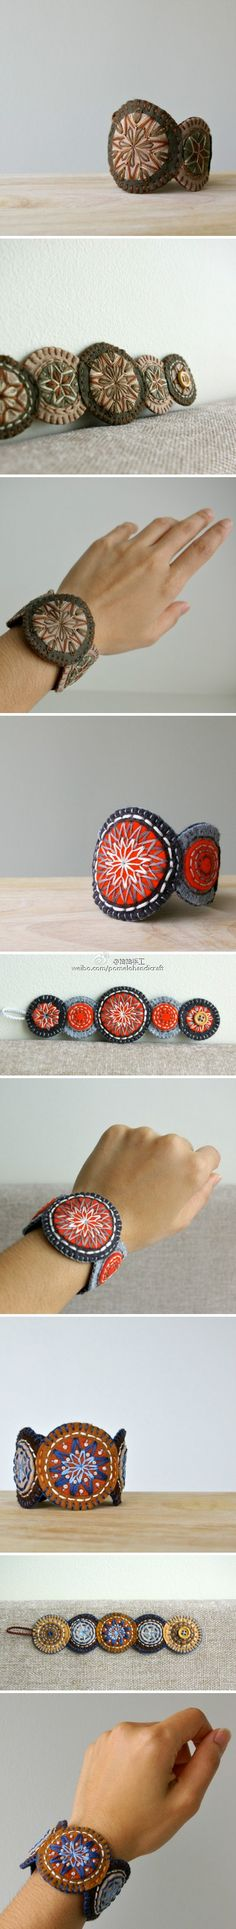 Borduurwerk armband